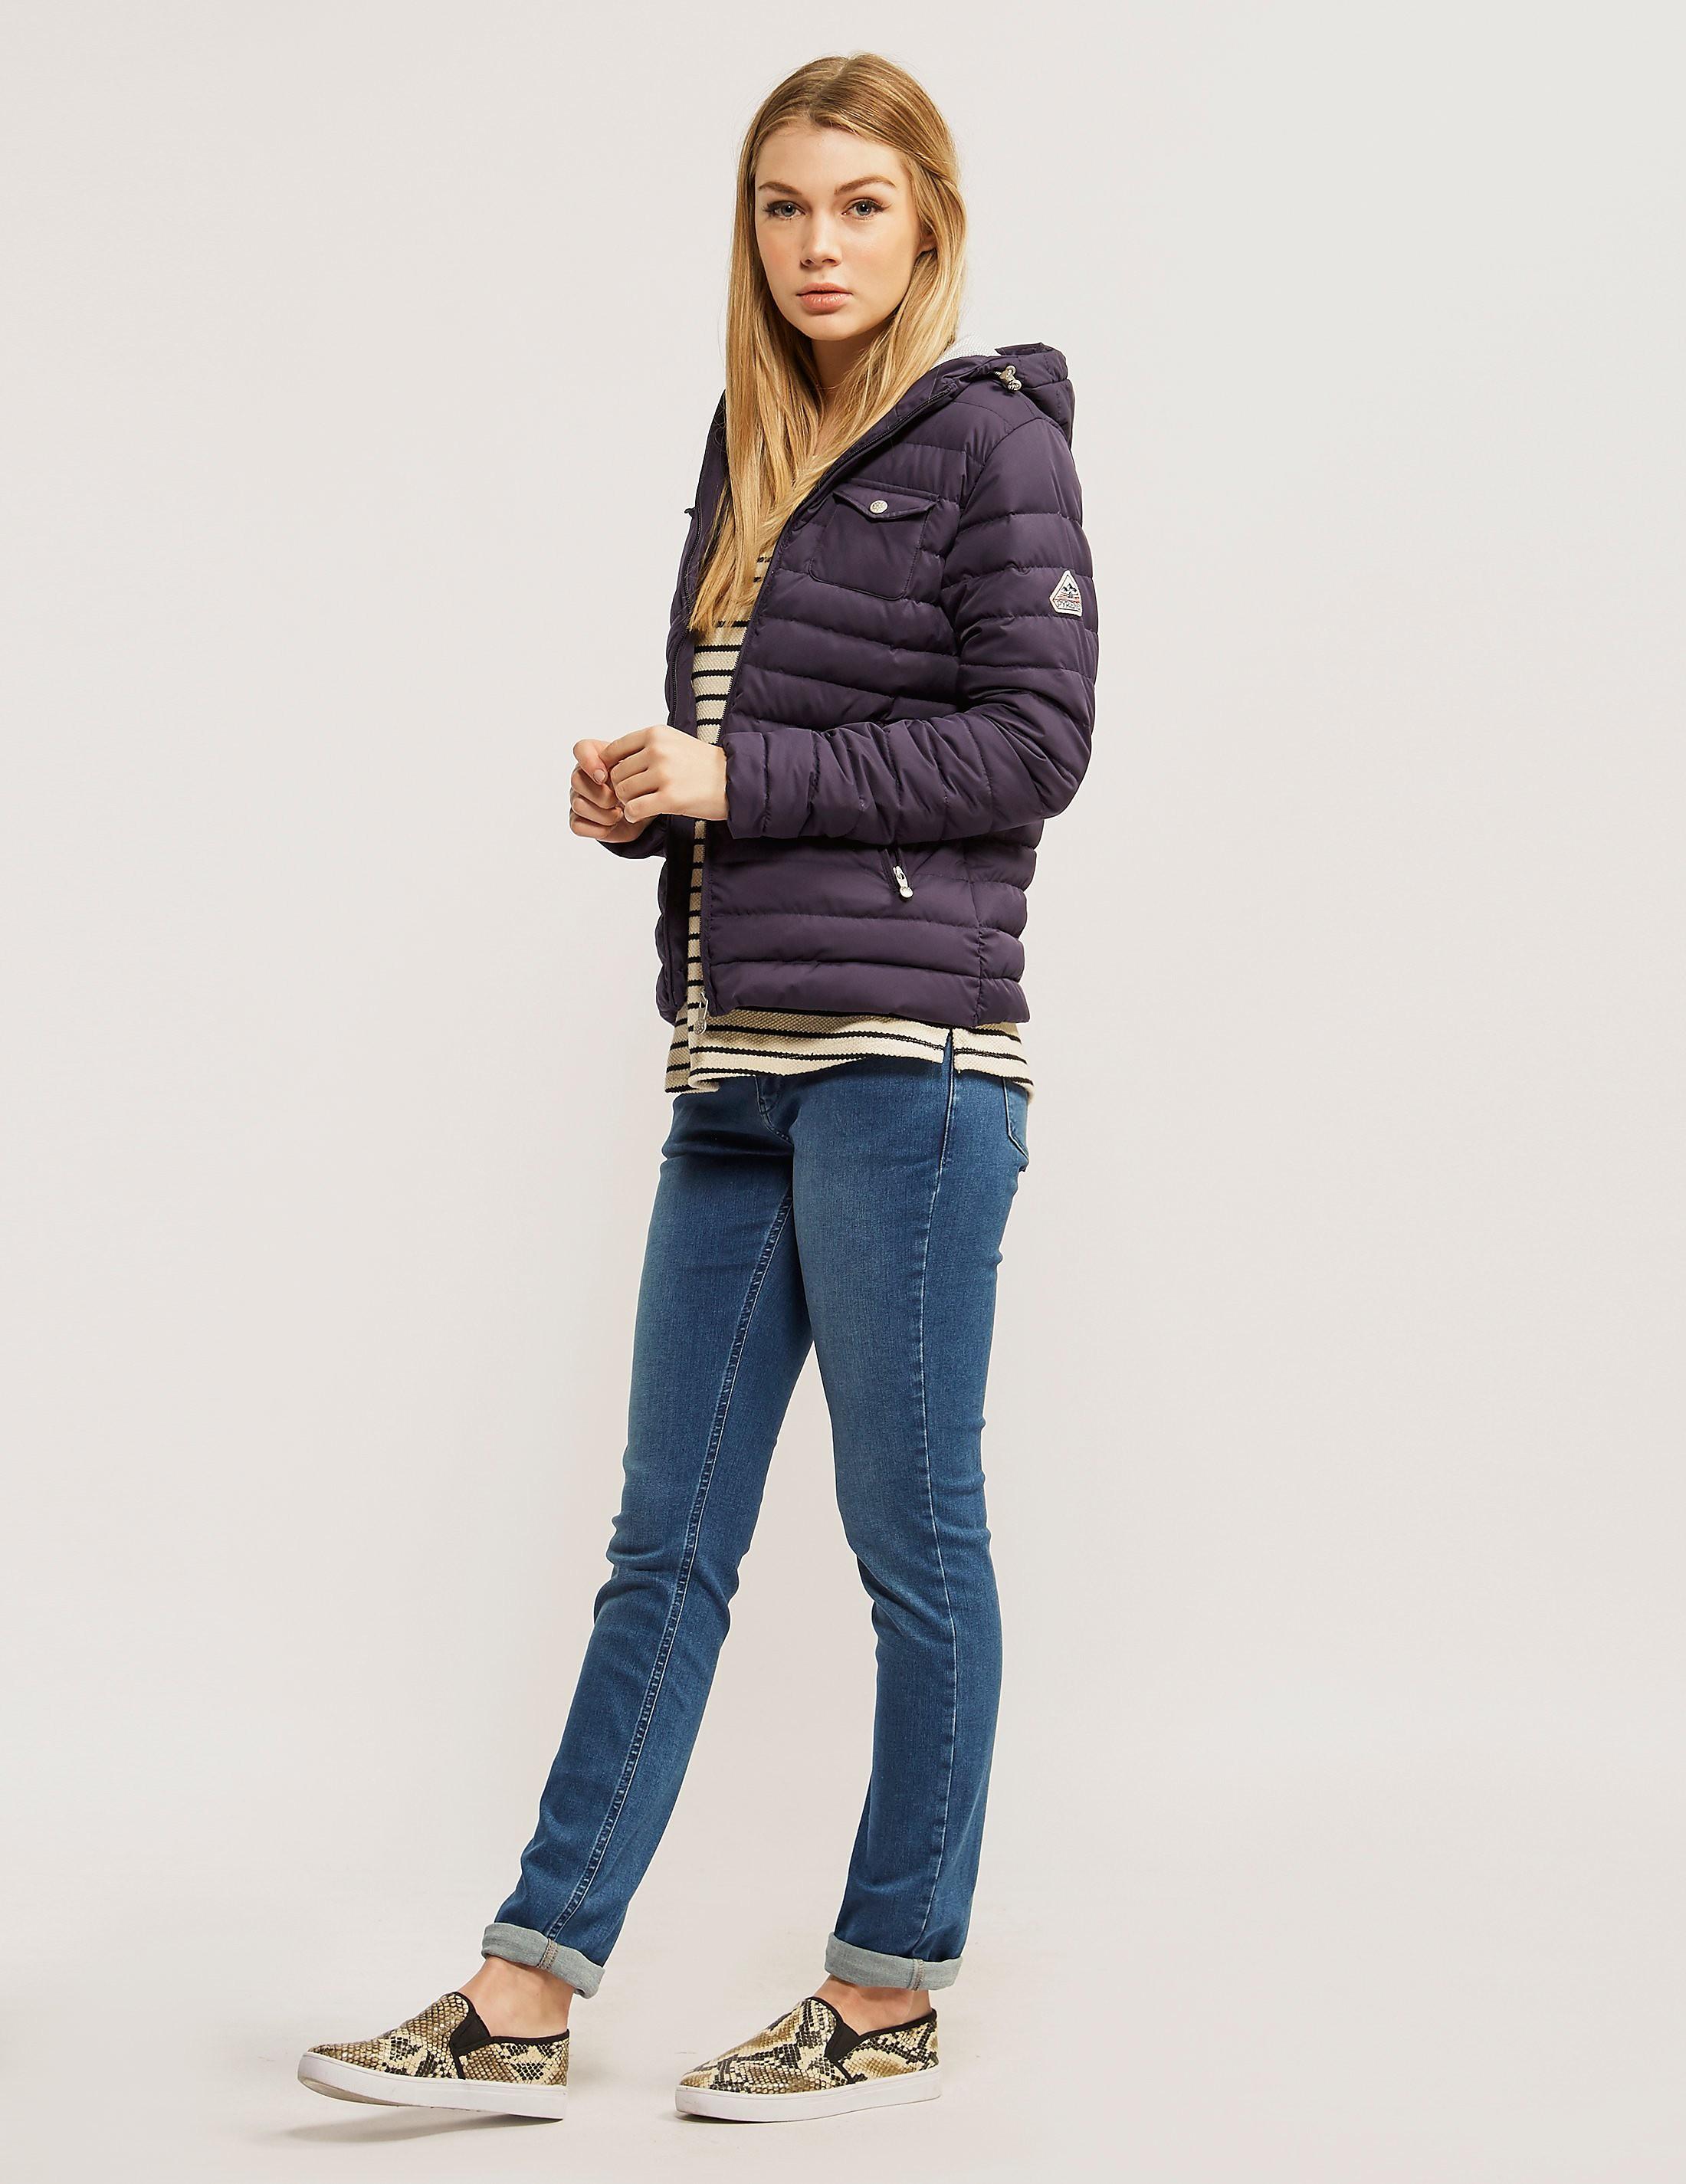 Pyrenex Ancolie Jacket